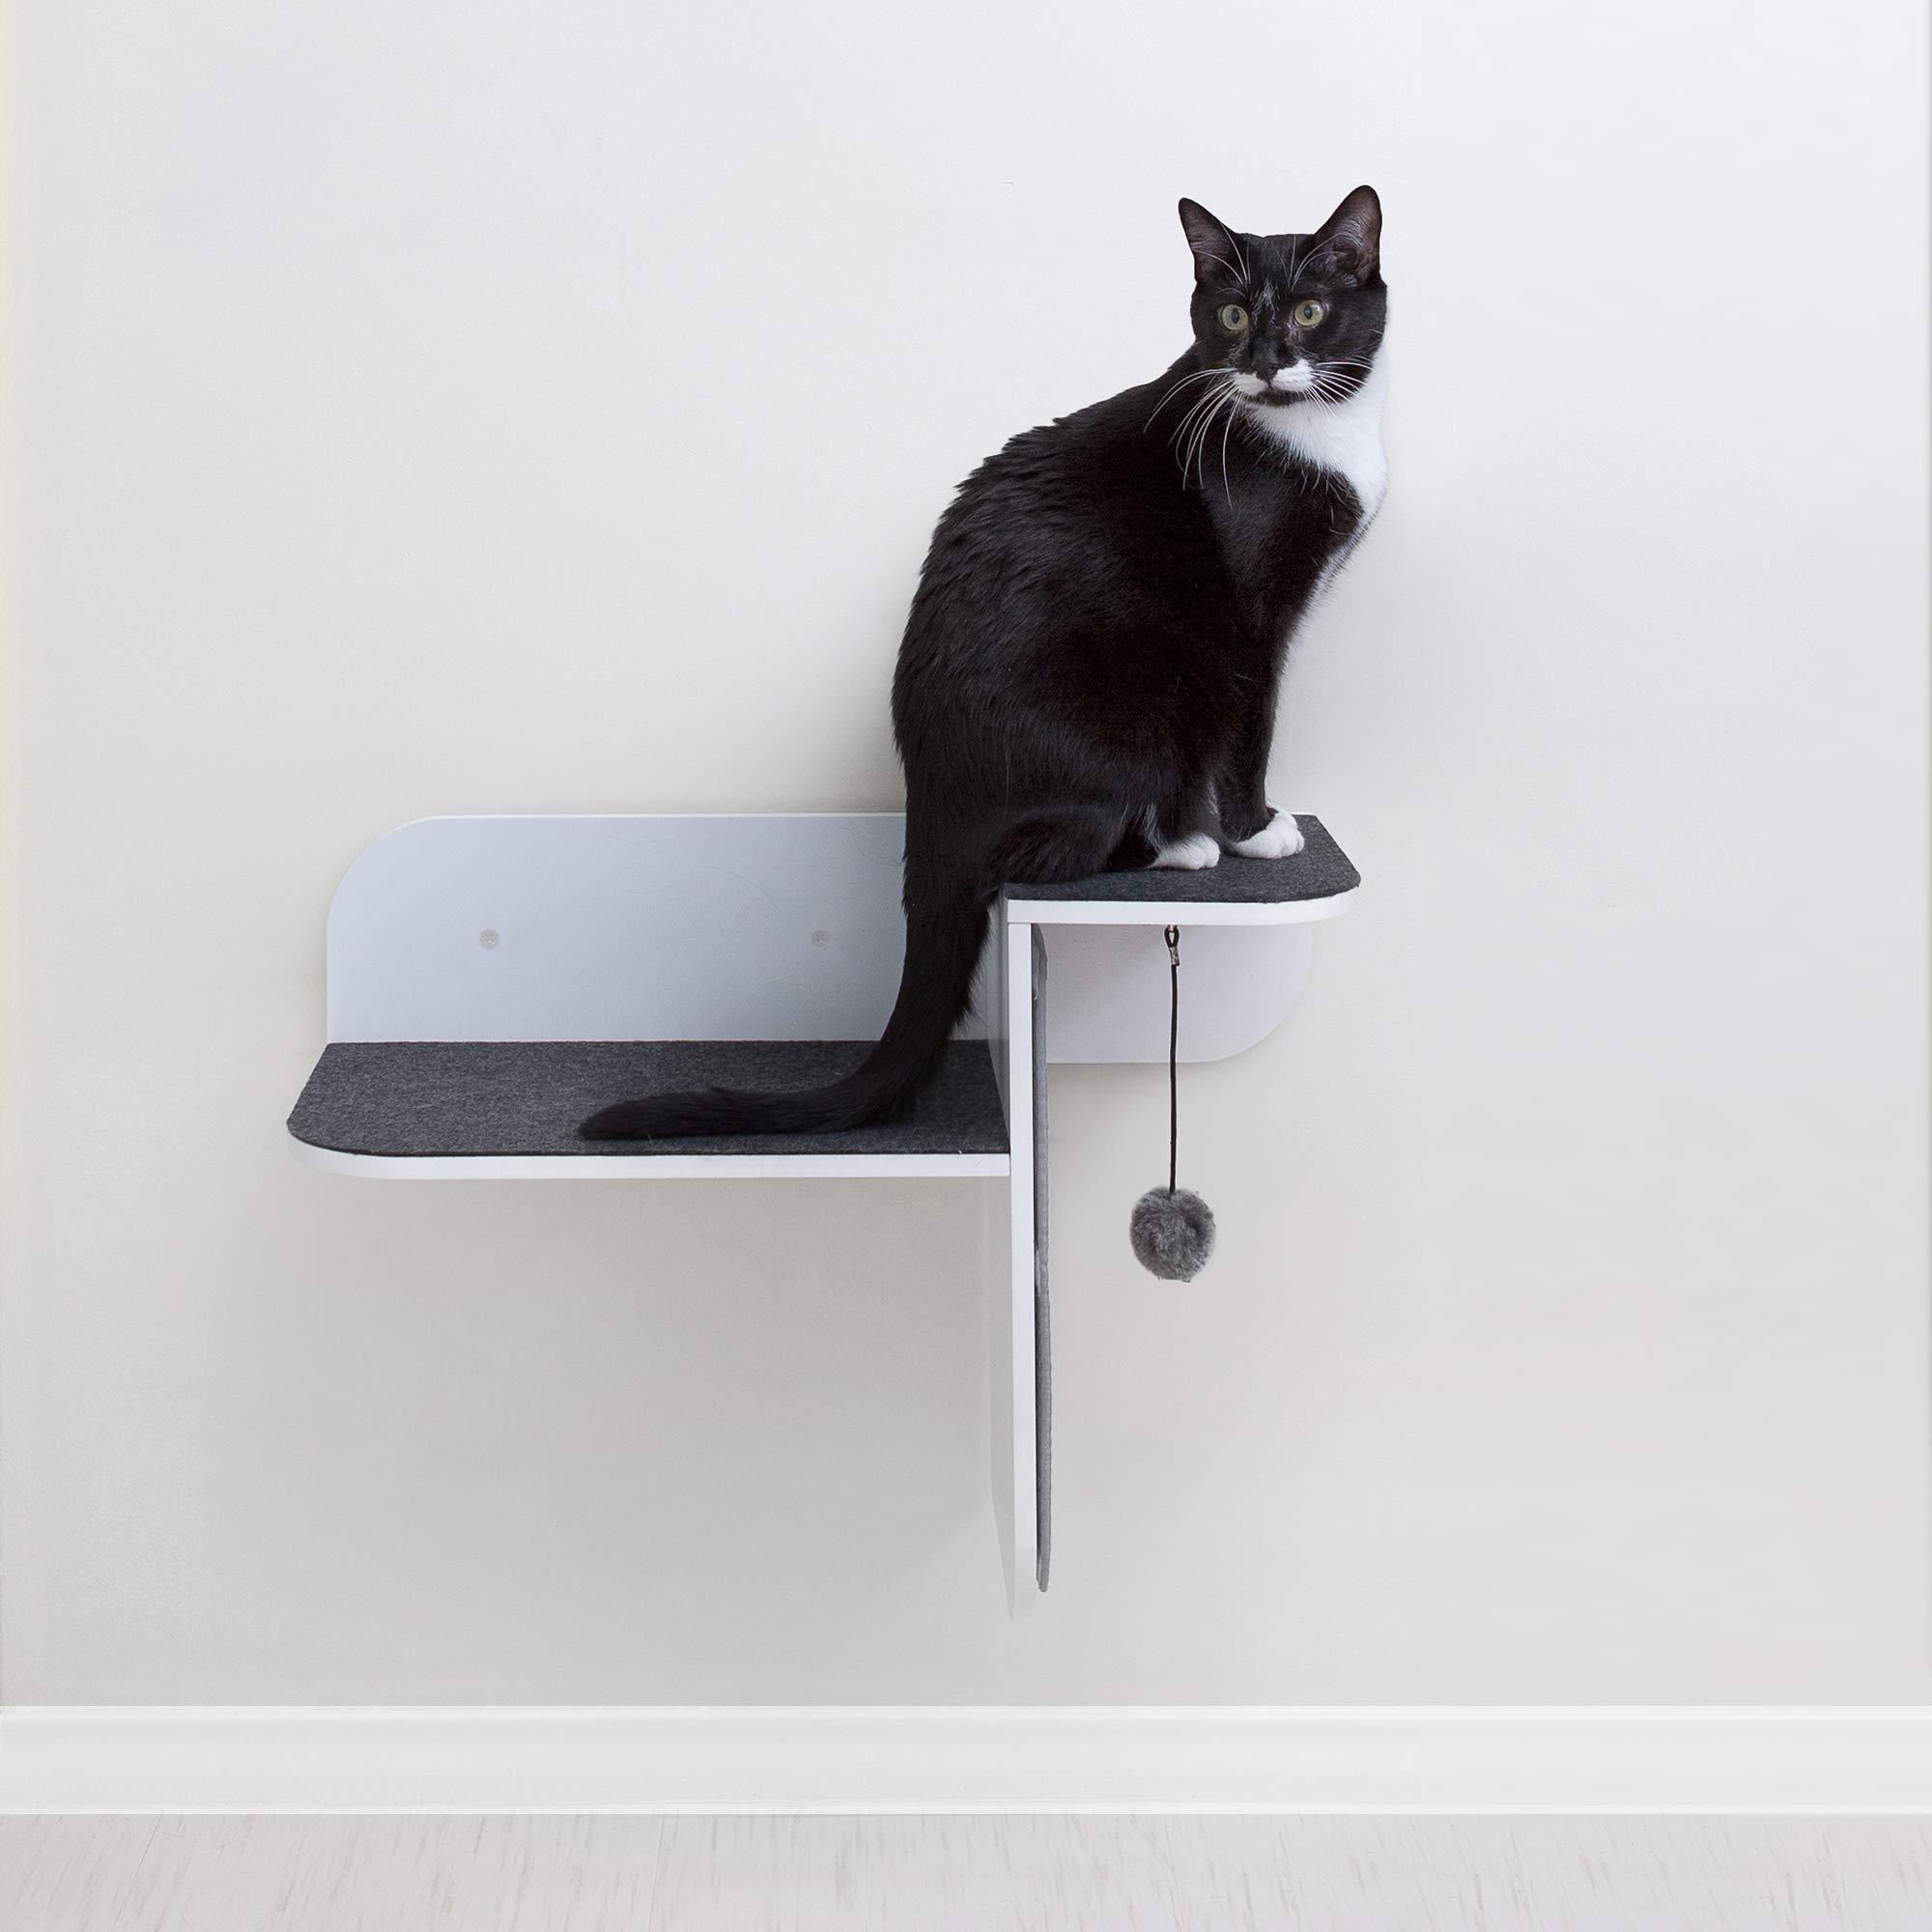 Primetime Petz Hauspanther Step Perch - Wall-Mounted Cat Perch & Scratcher, White by Primetime Petz